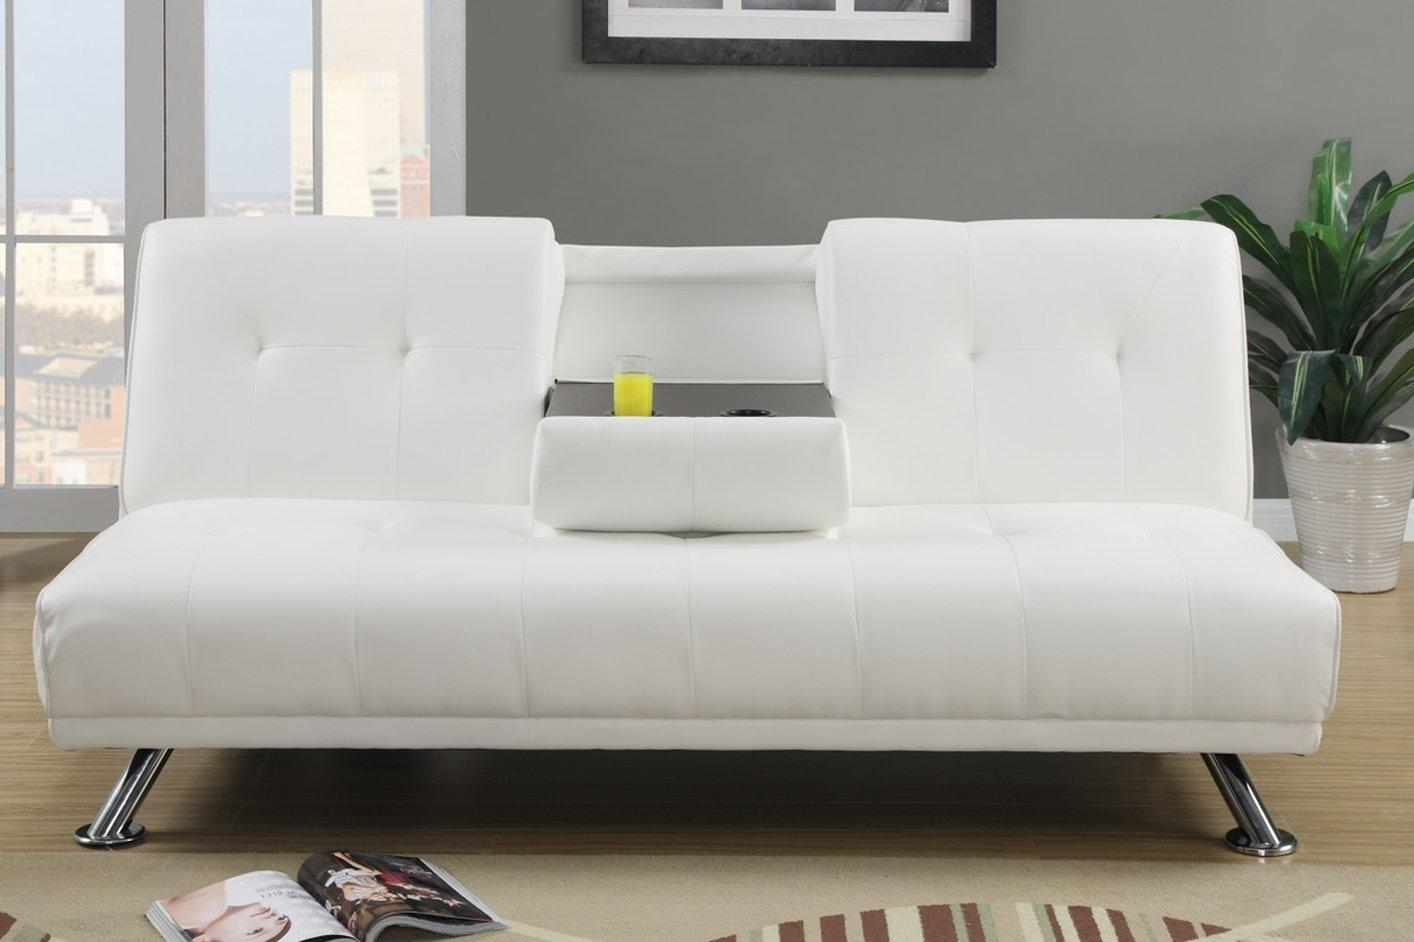 Sofas Center : Modern White Leather Sleeper Sofa Bedwhite Faux Pertaining To Los Angeles Sleeper Sofas (View 6 of 20)